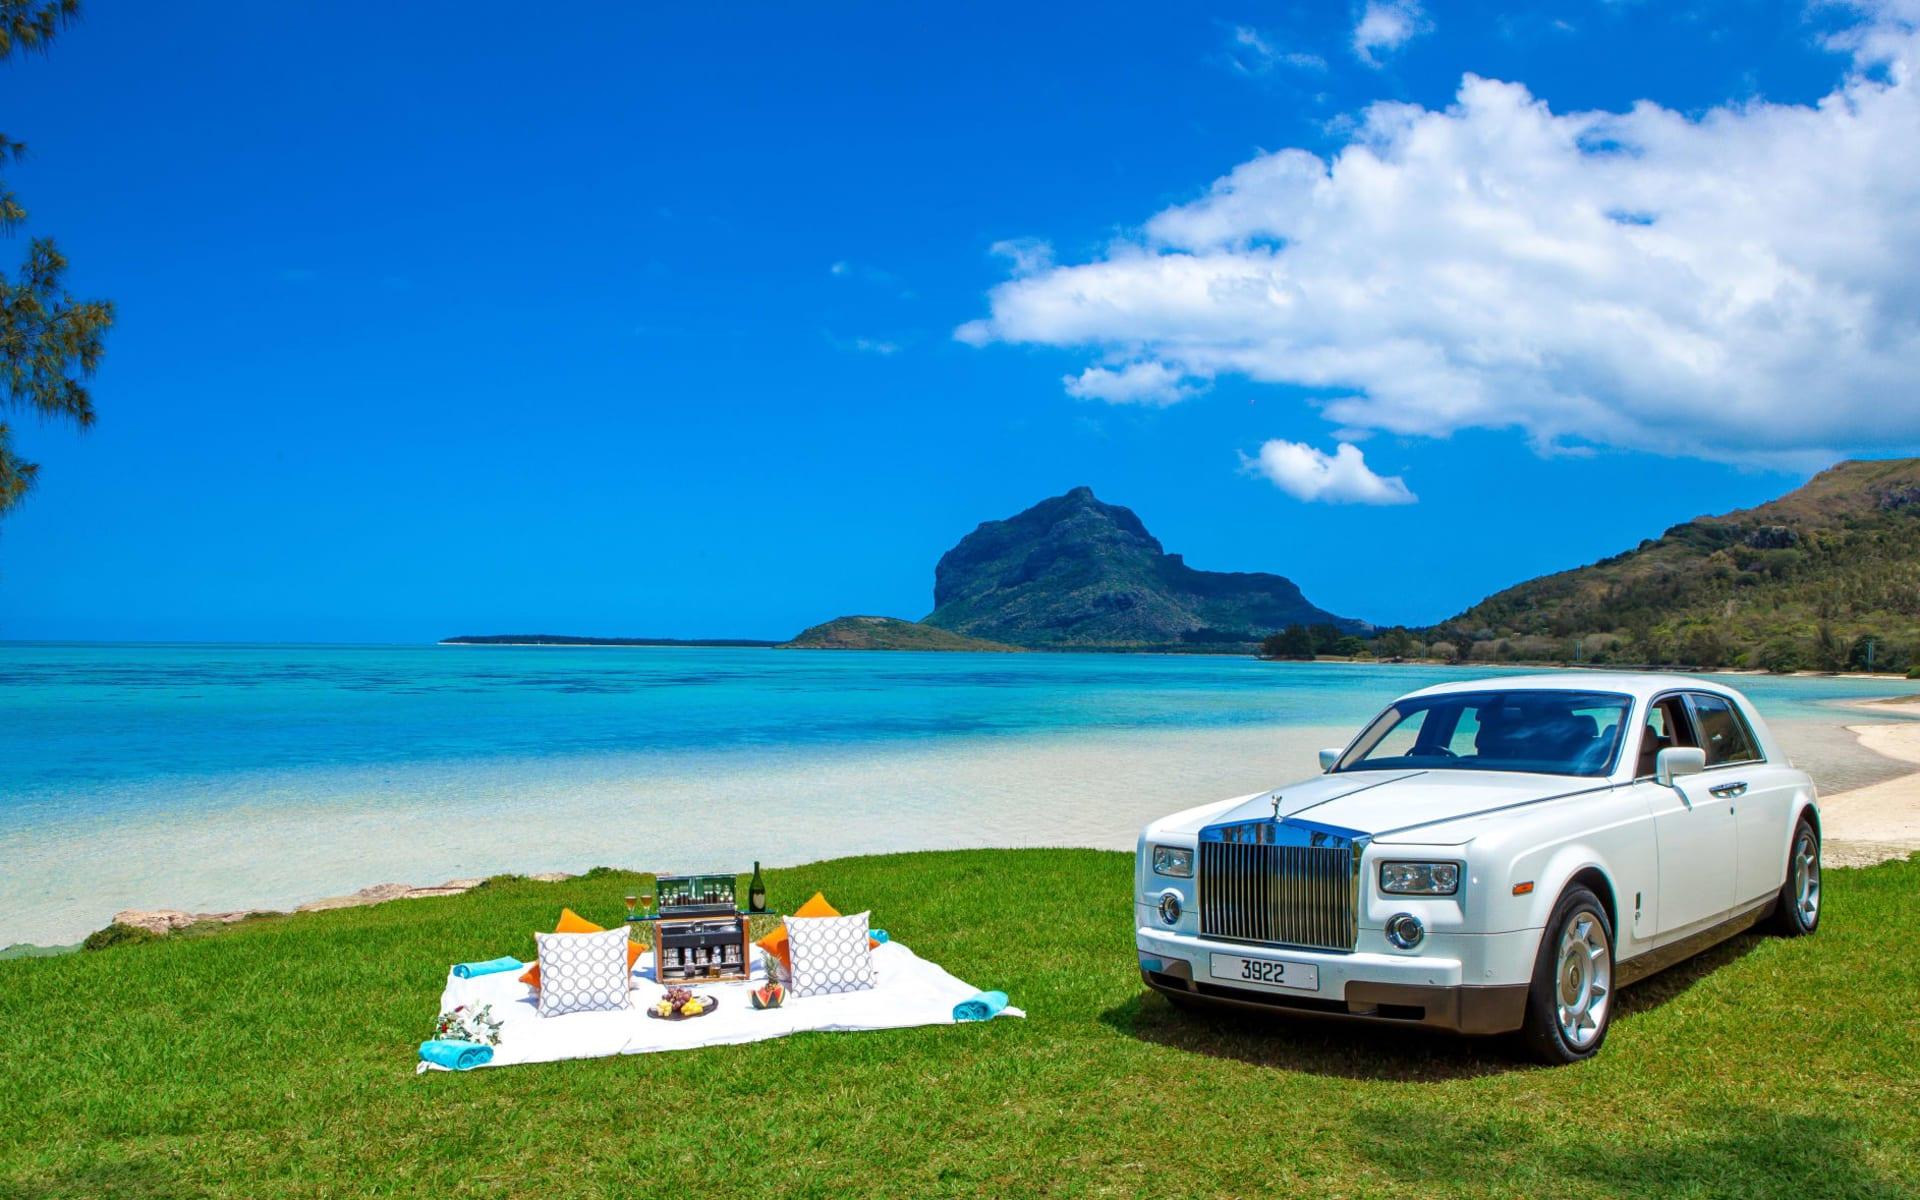 Maradiva Villas Resort & Spa in Wolmar, Flic en Flac: Rolls Royce Picnic Hamper